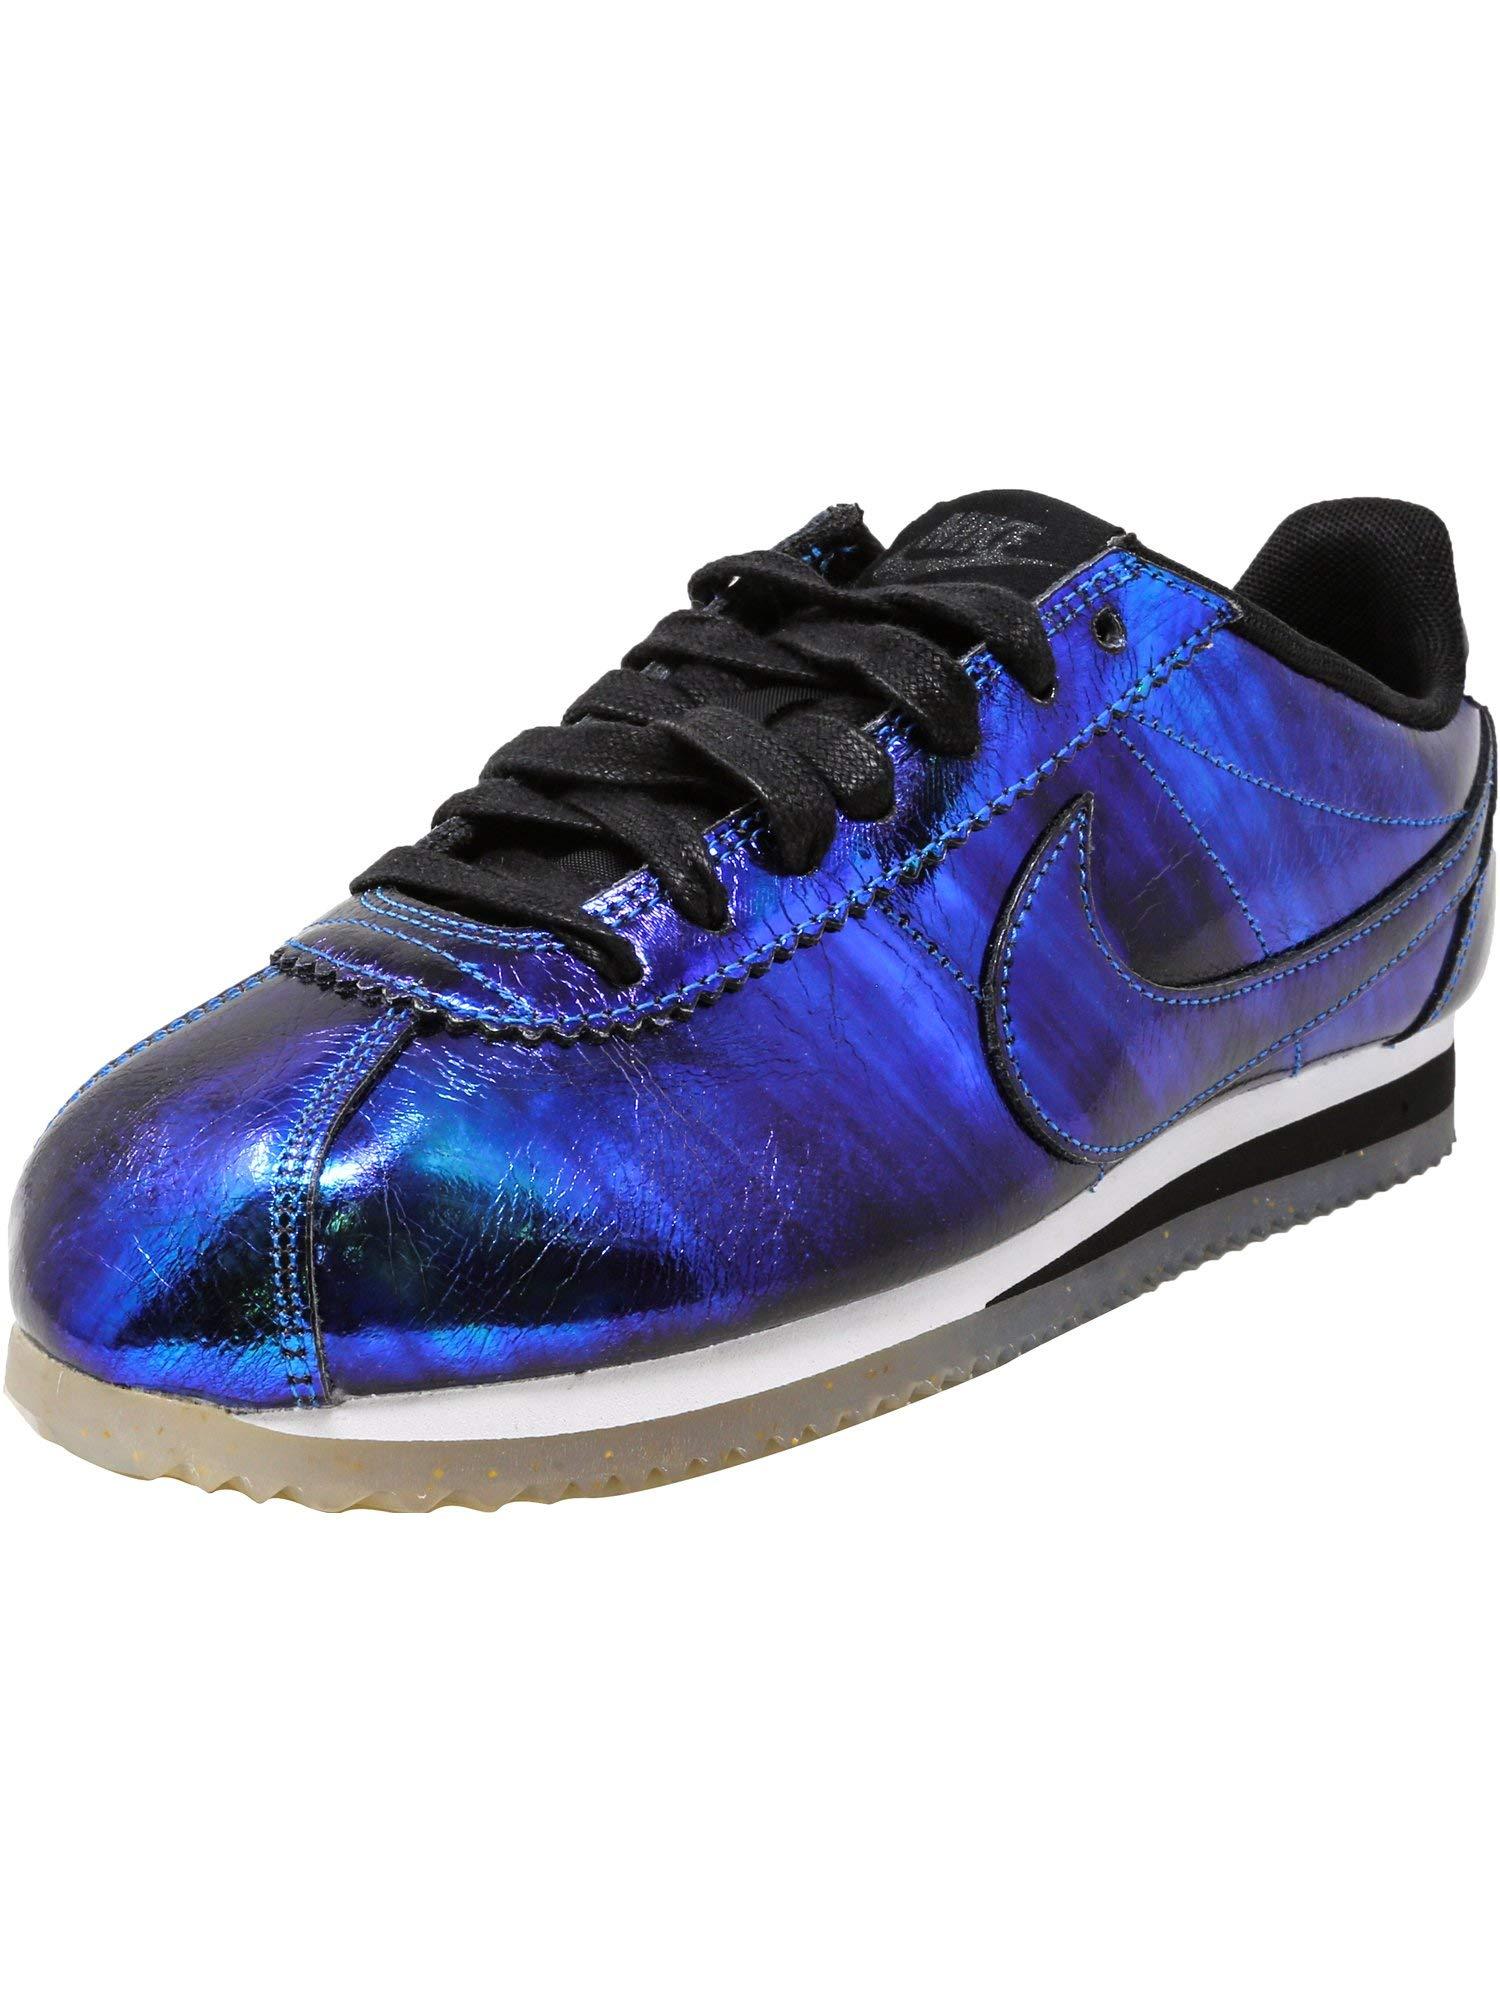 wholesale dealer 886ea d115c Galleon - Nike Women s Classic Cortez Leather Se Soar Soar-White-Black  Ankle-High Fashion Sneaker - 7.5M